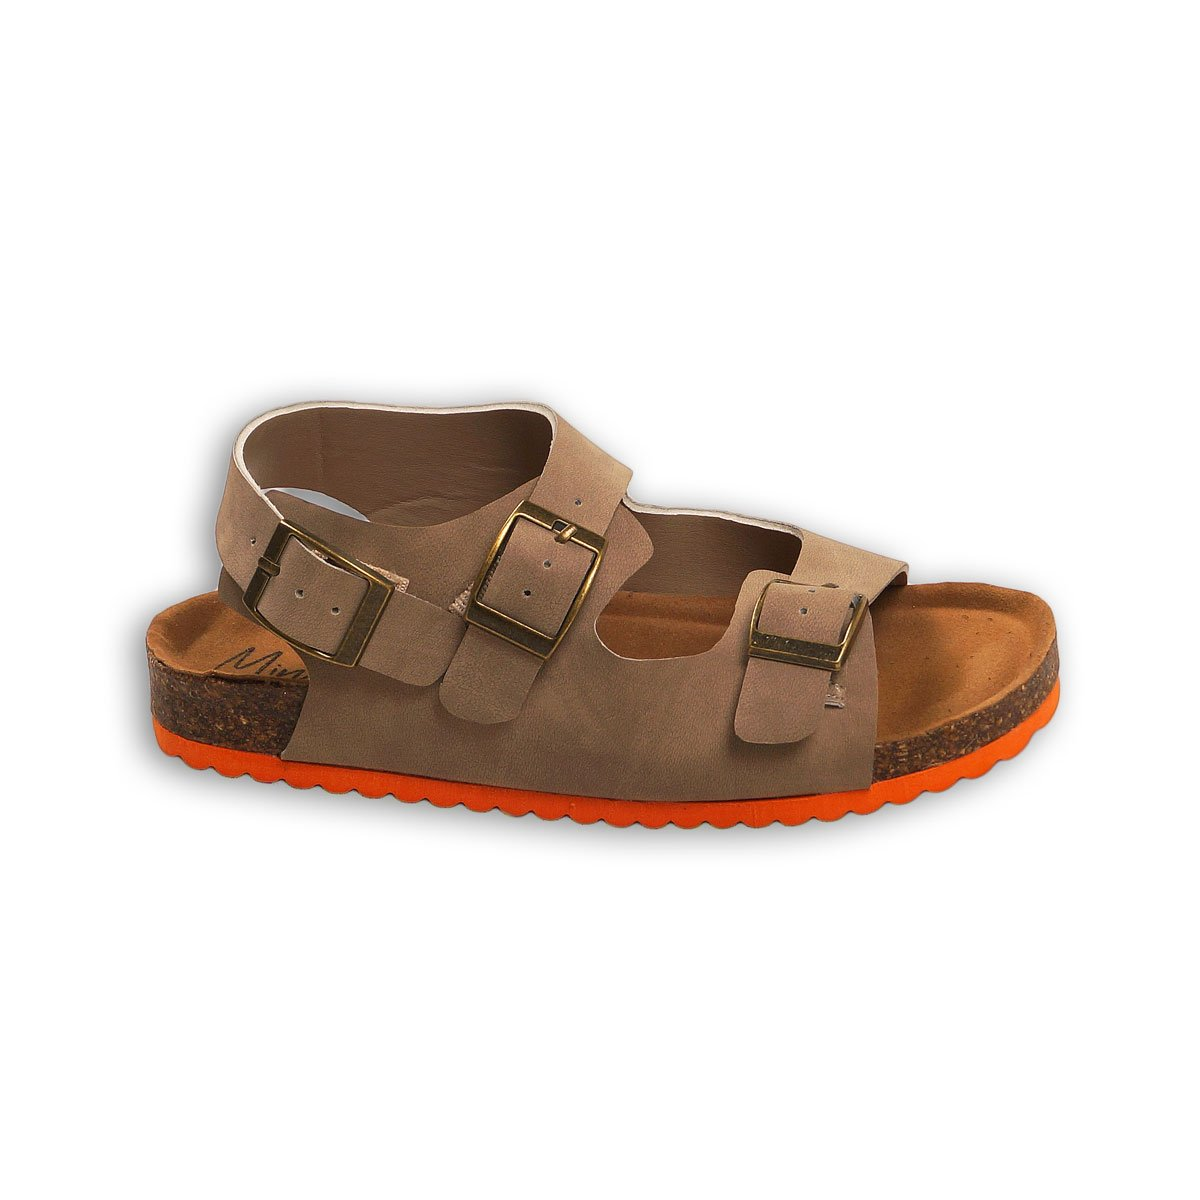 Sandale in curele duble cu catarame, Minoti Shoe imagine